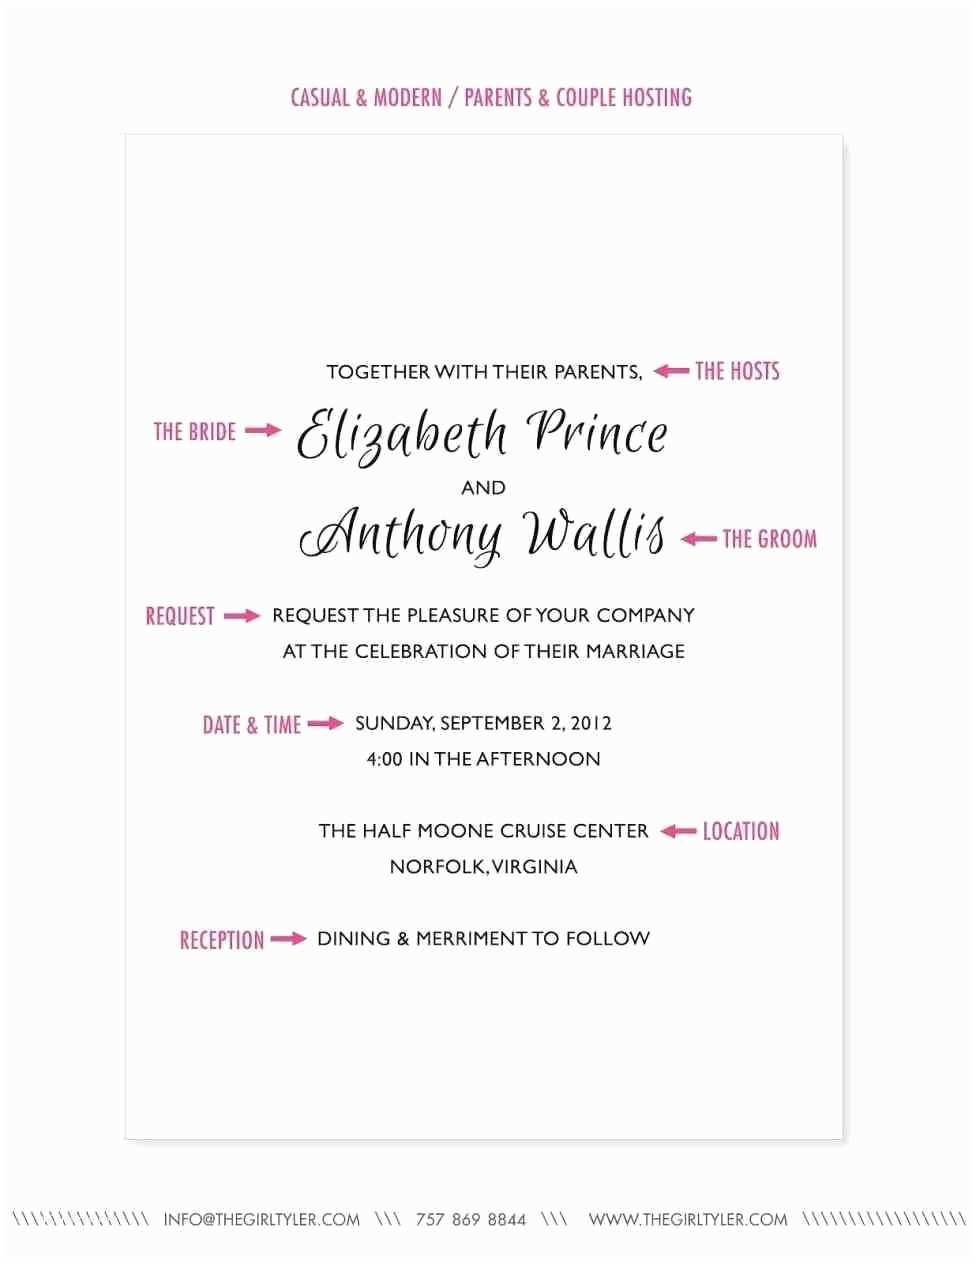 Wedding Invitation Wording Couple Hosting Traditional Wedding Invitation Samples